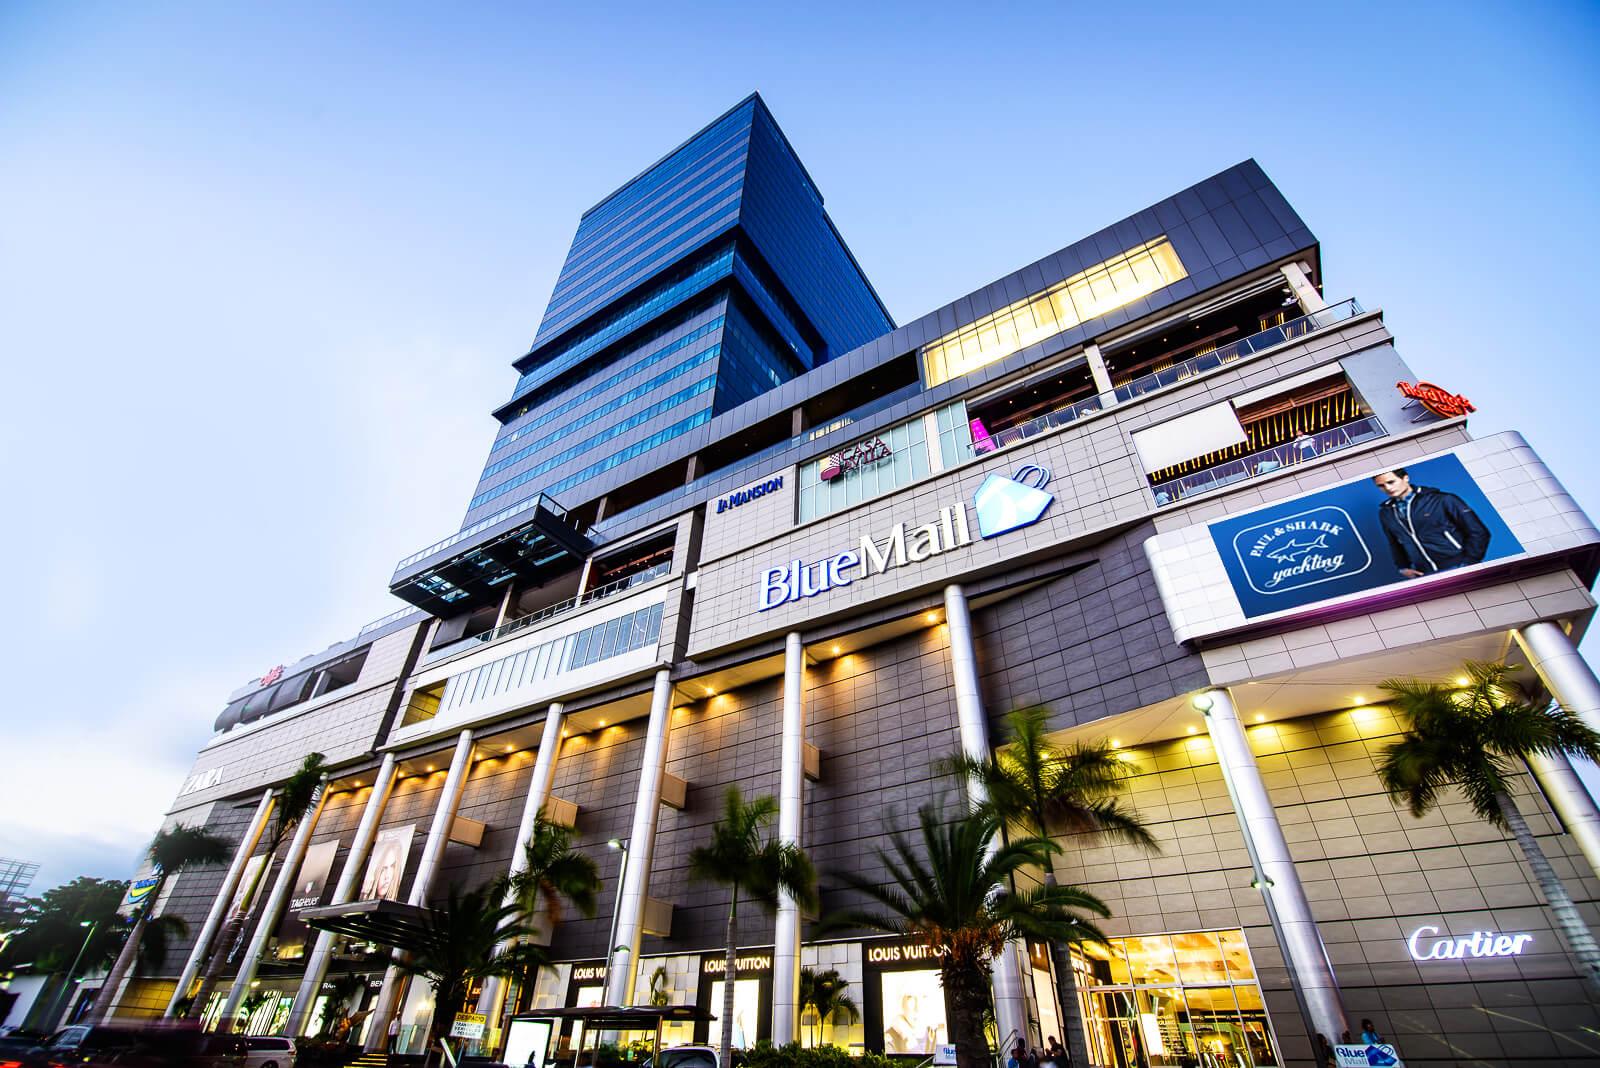 Shopping malls in santo domingo dominican republic - Centro comercial moda shoping ...